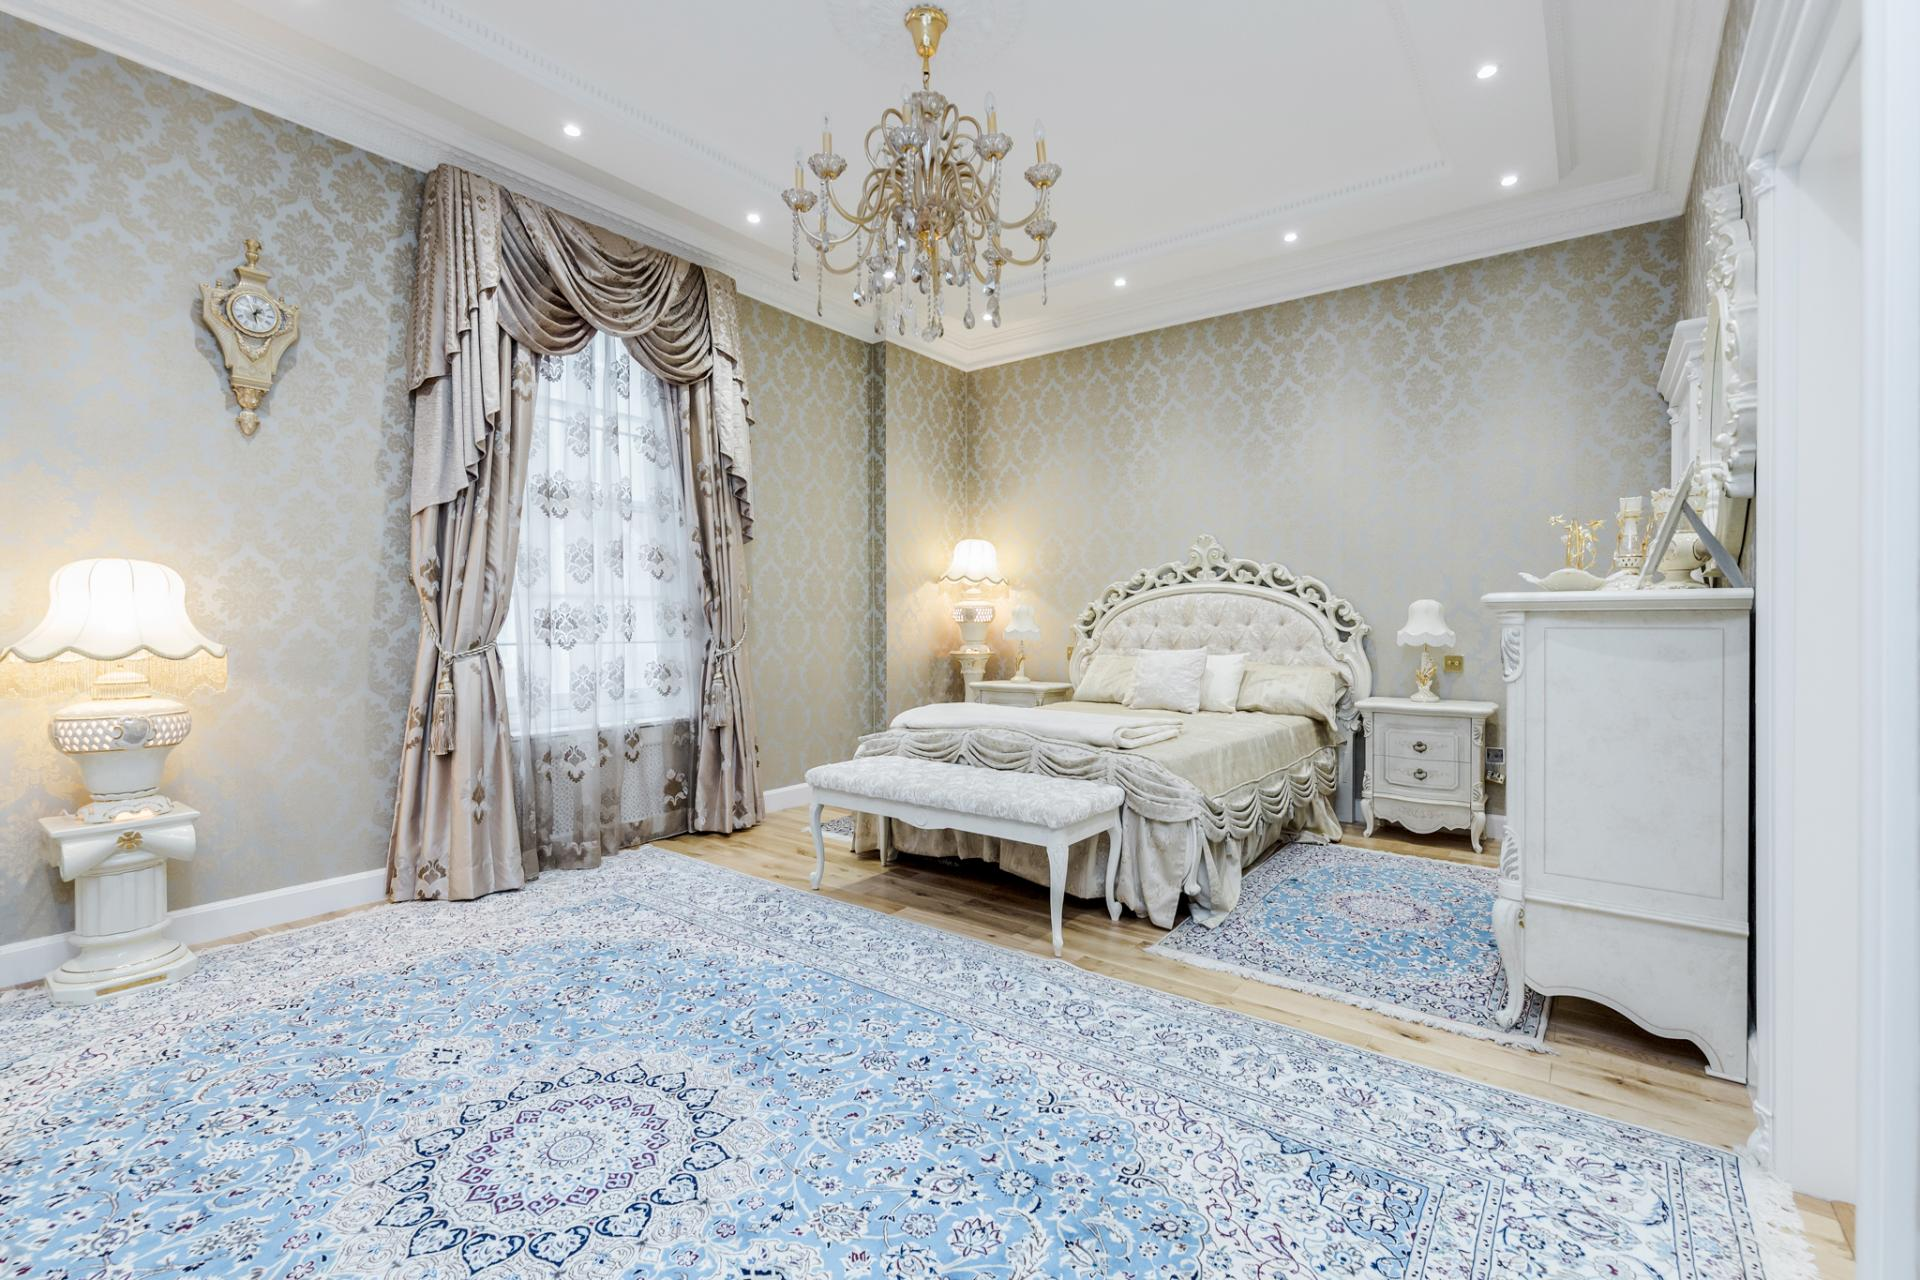 Spacious bedroom at Grosvenor Square Apartment, Mayfair, London